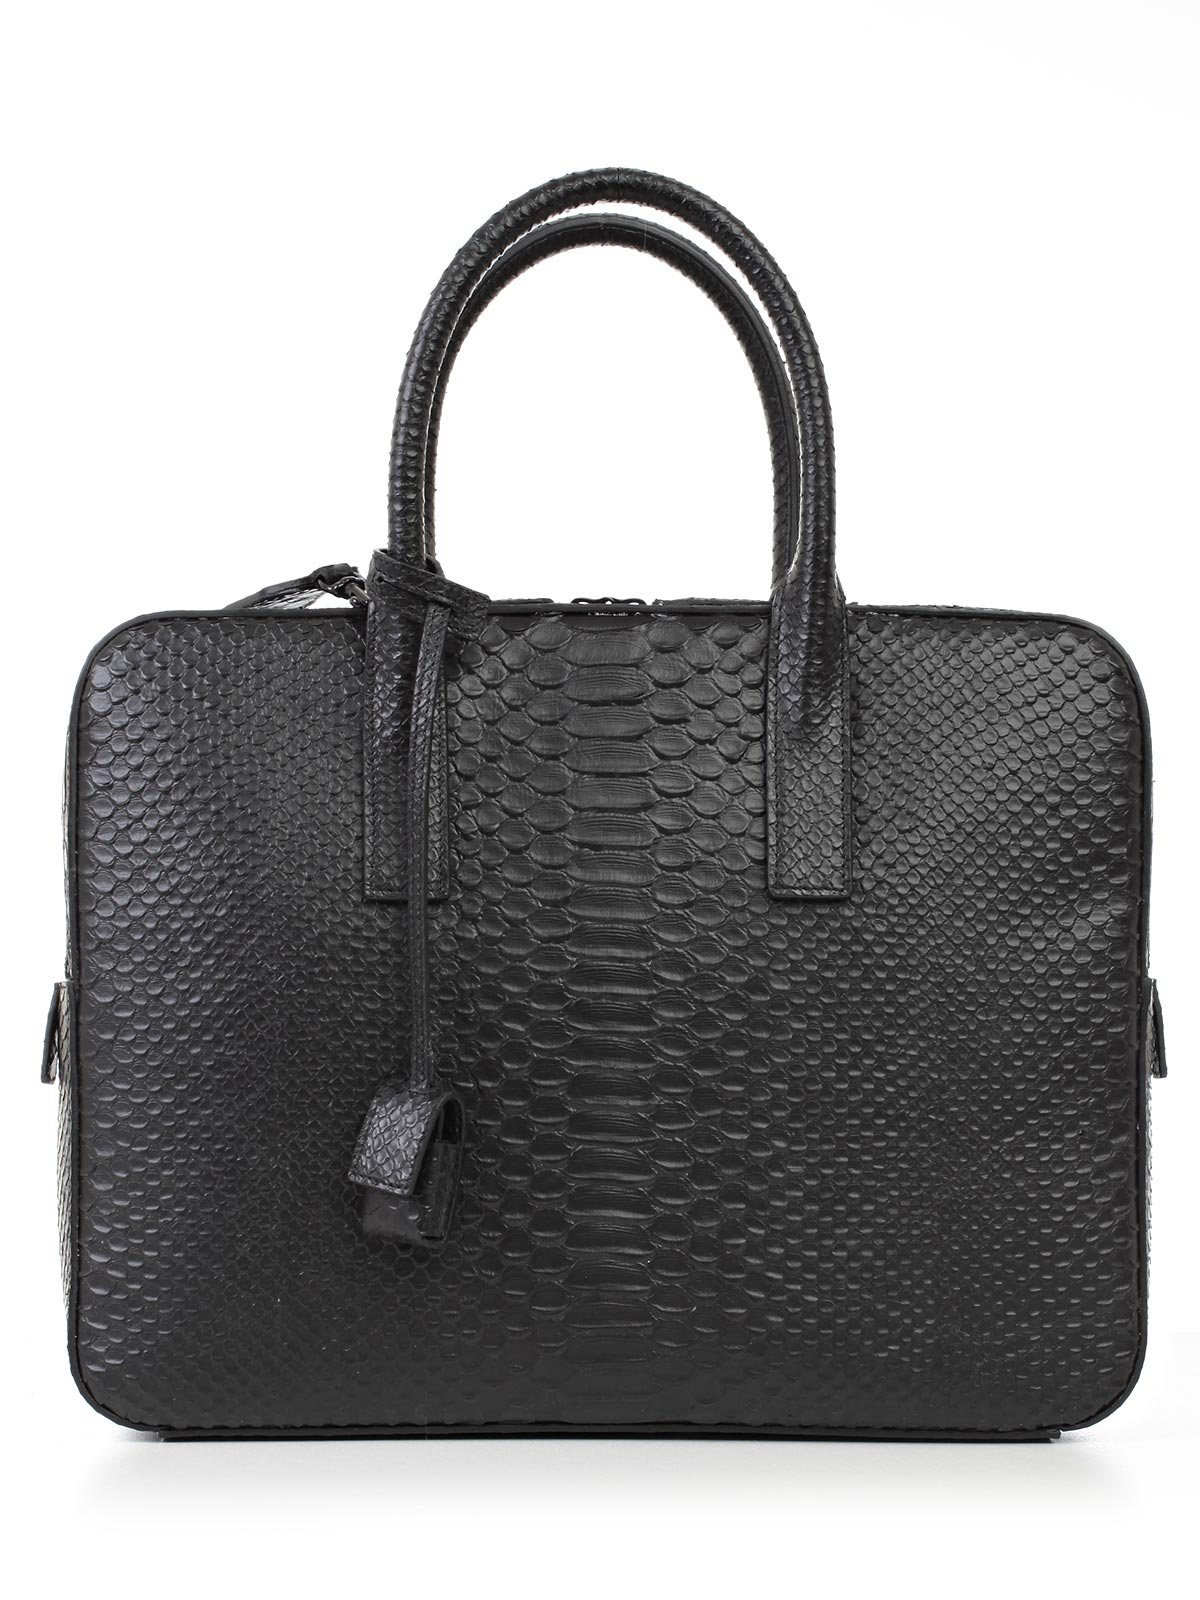 Picture of SAINT LAURENT Bags